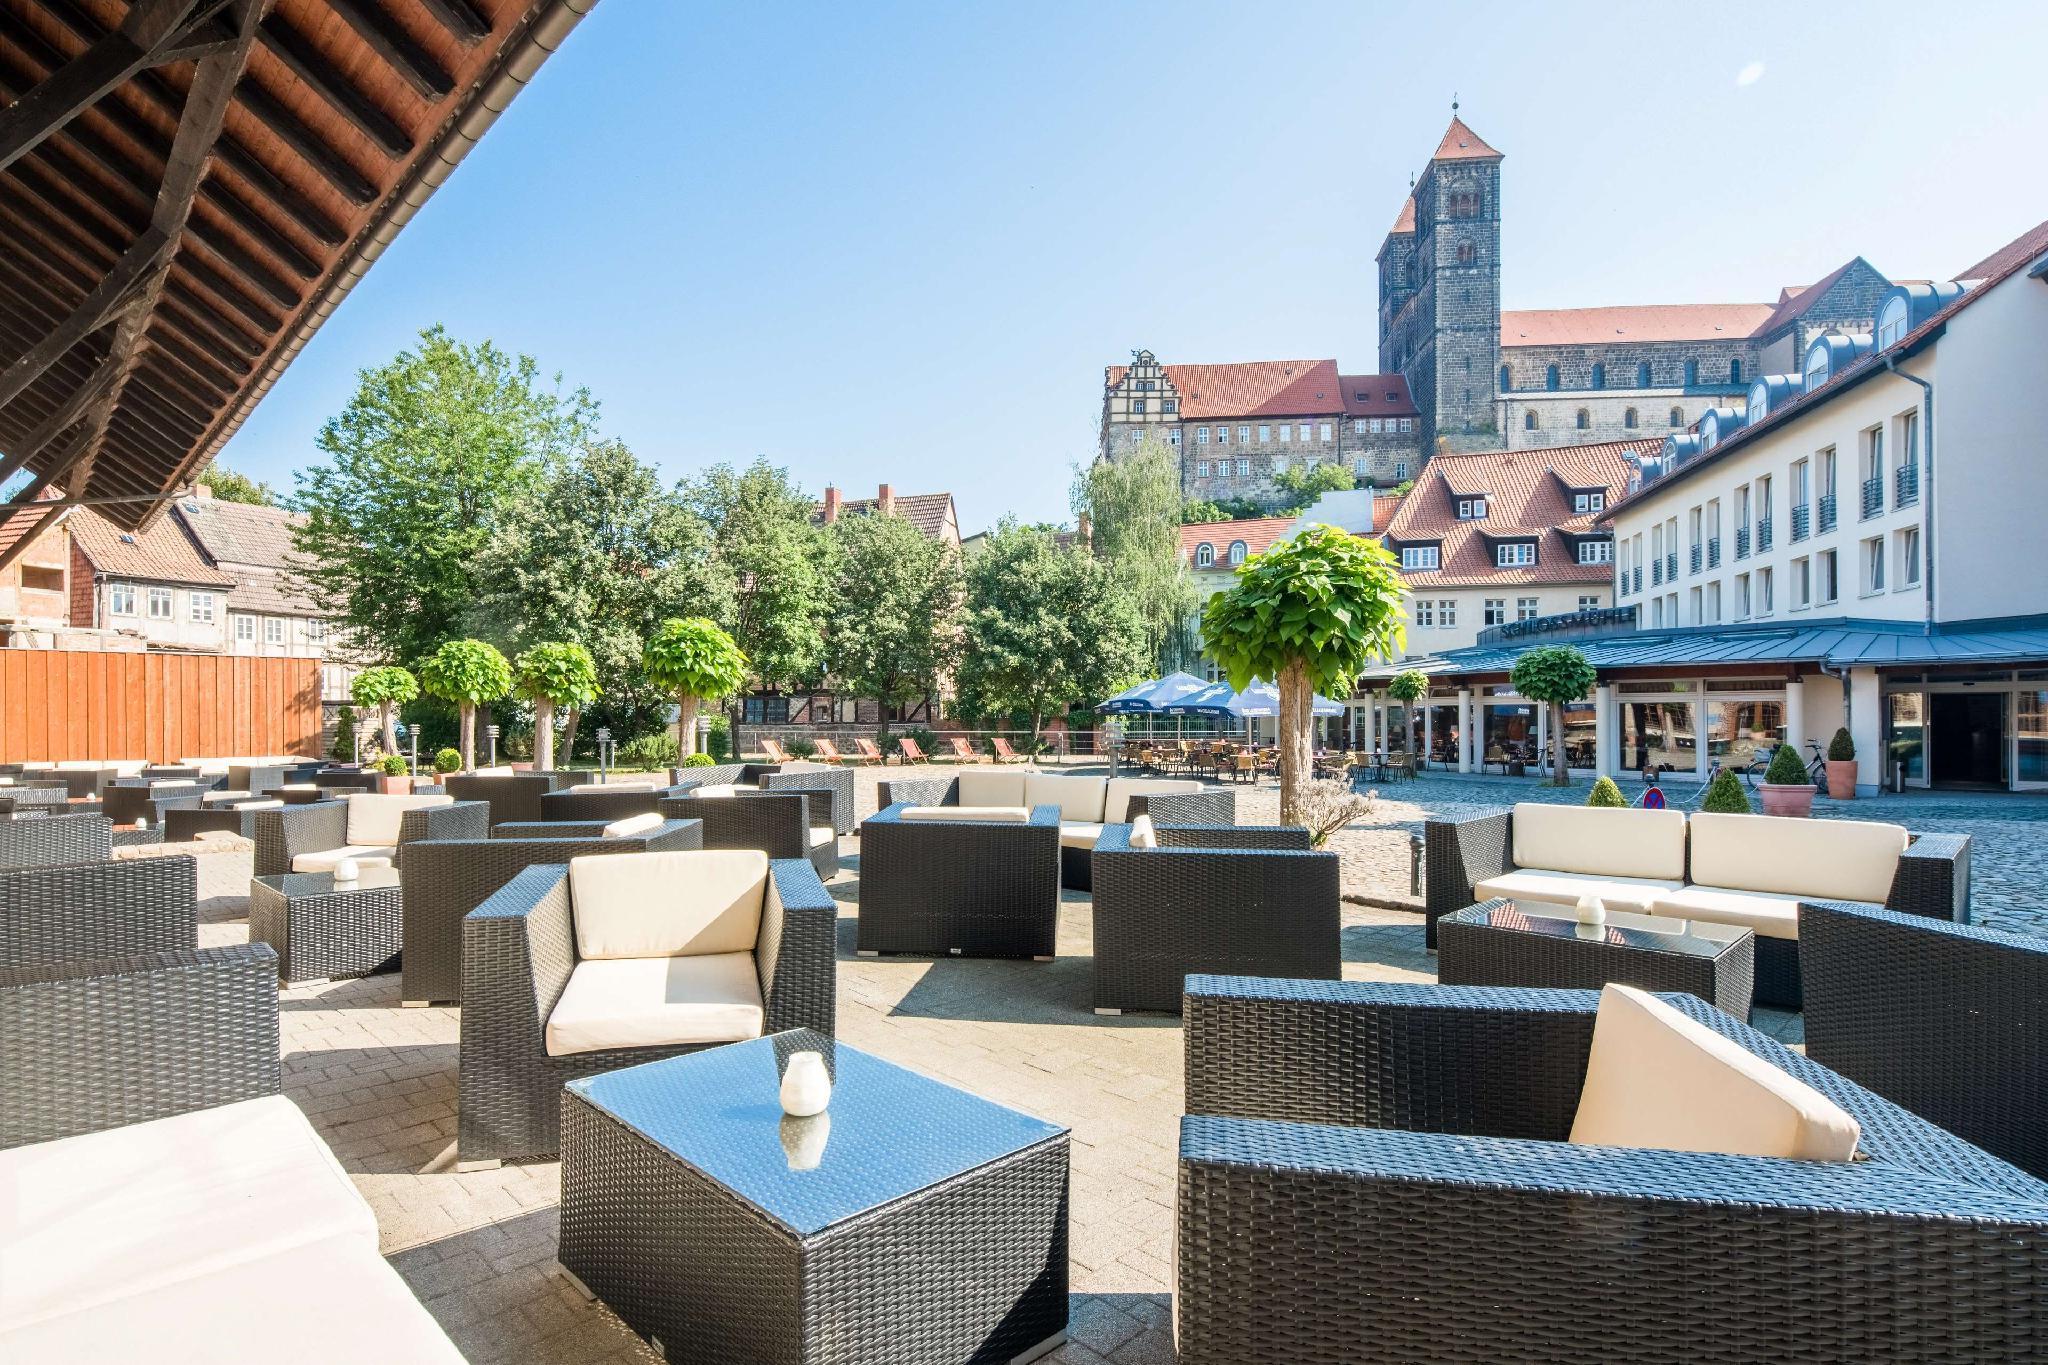 BEST WESTERN Hotel Schlossmhle